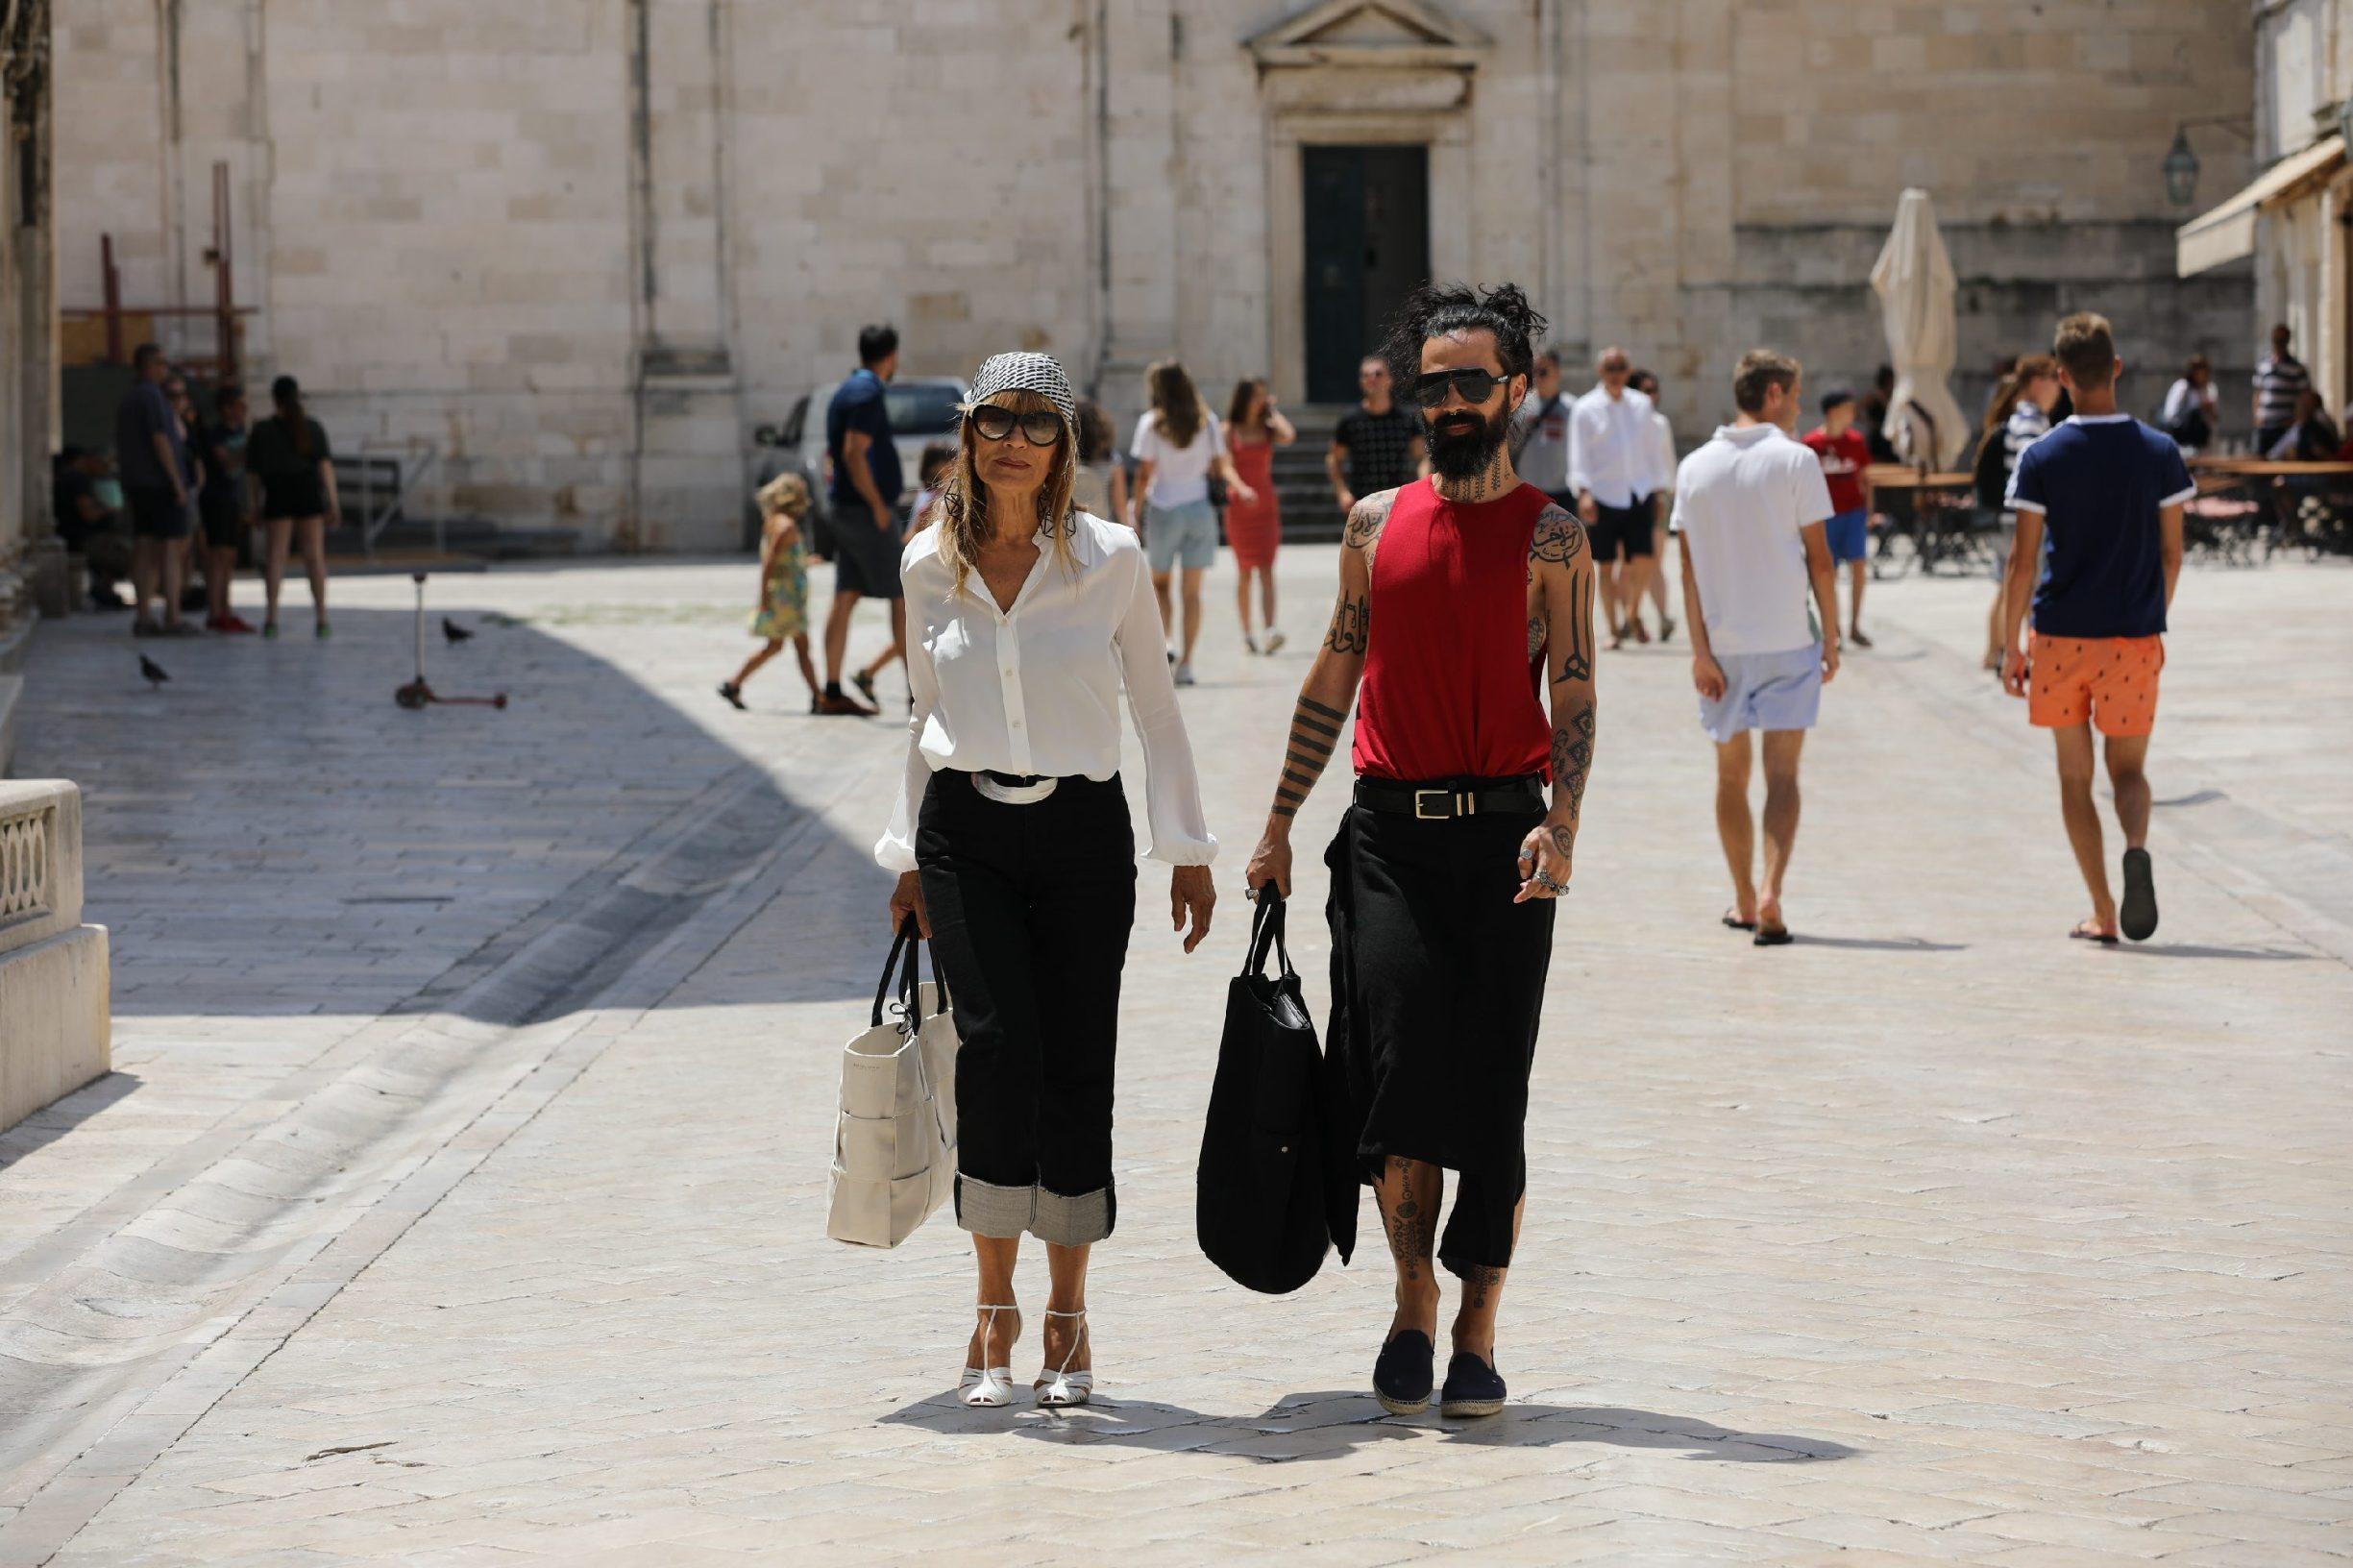 Dubrovnik, 070720. Bozo Vreco i Djurda Tedeschi na Stradunu. Foto: Bozo Radic / CROPIX